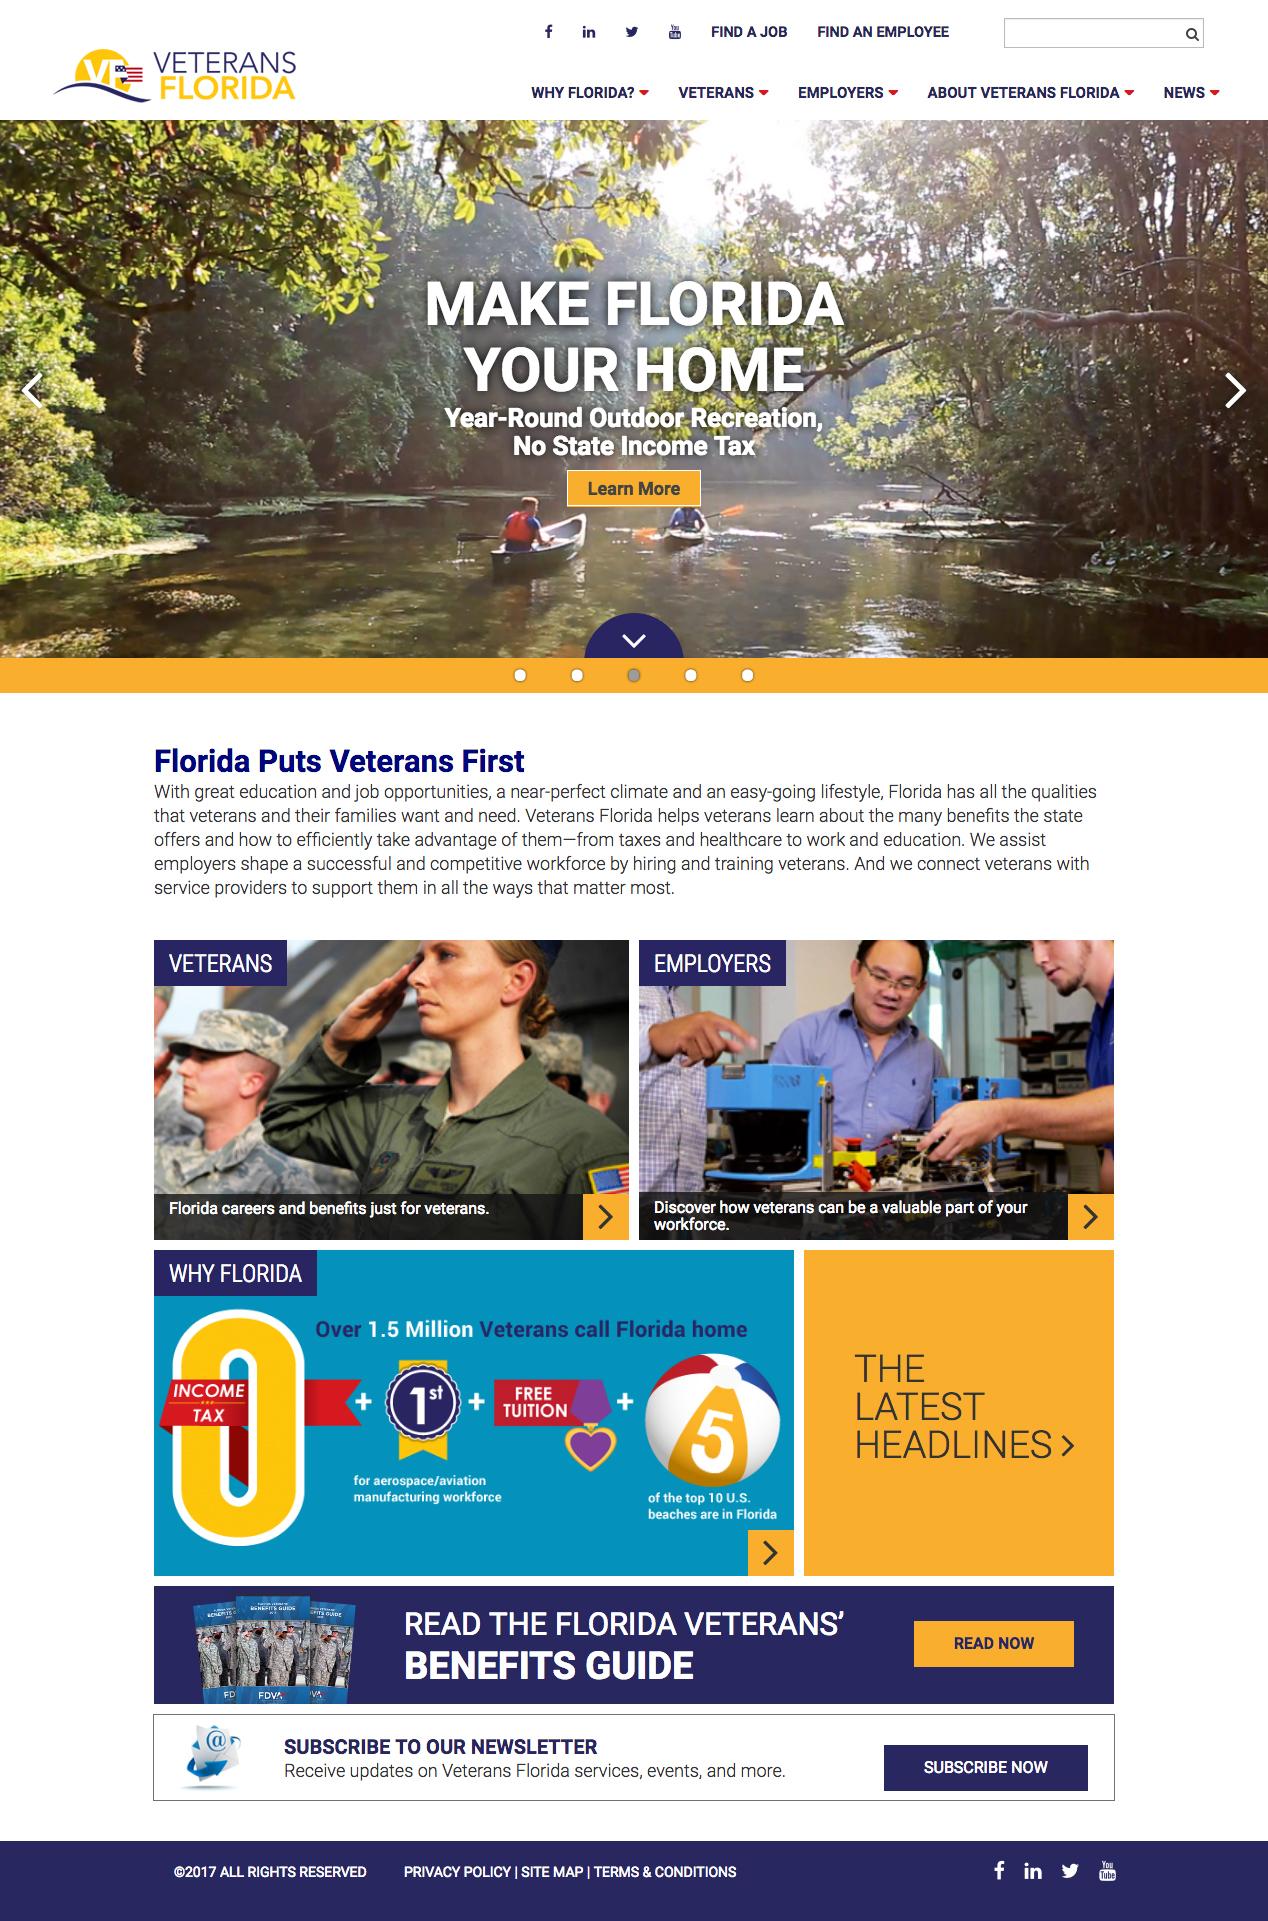 Veterans Florida, Florida Works for Veterans